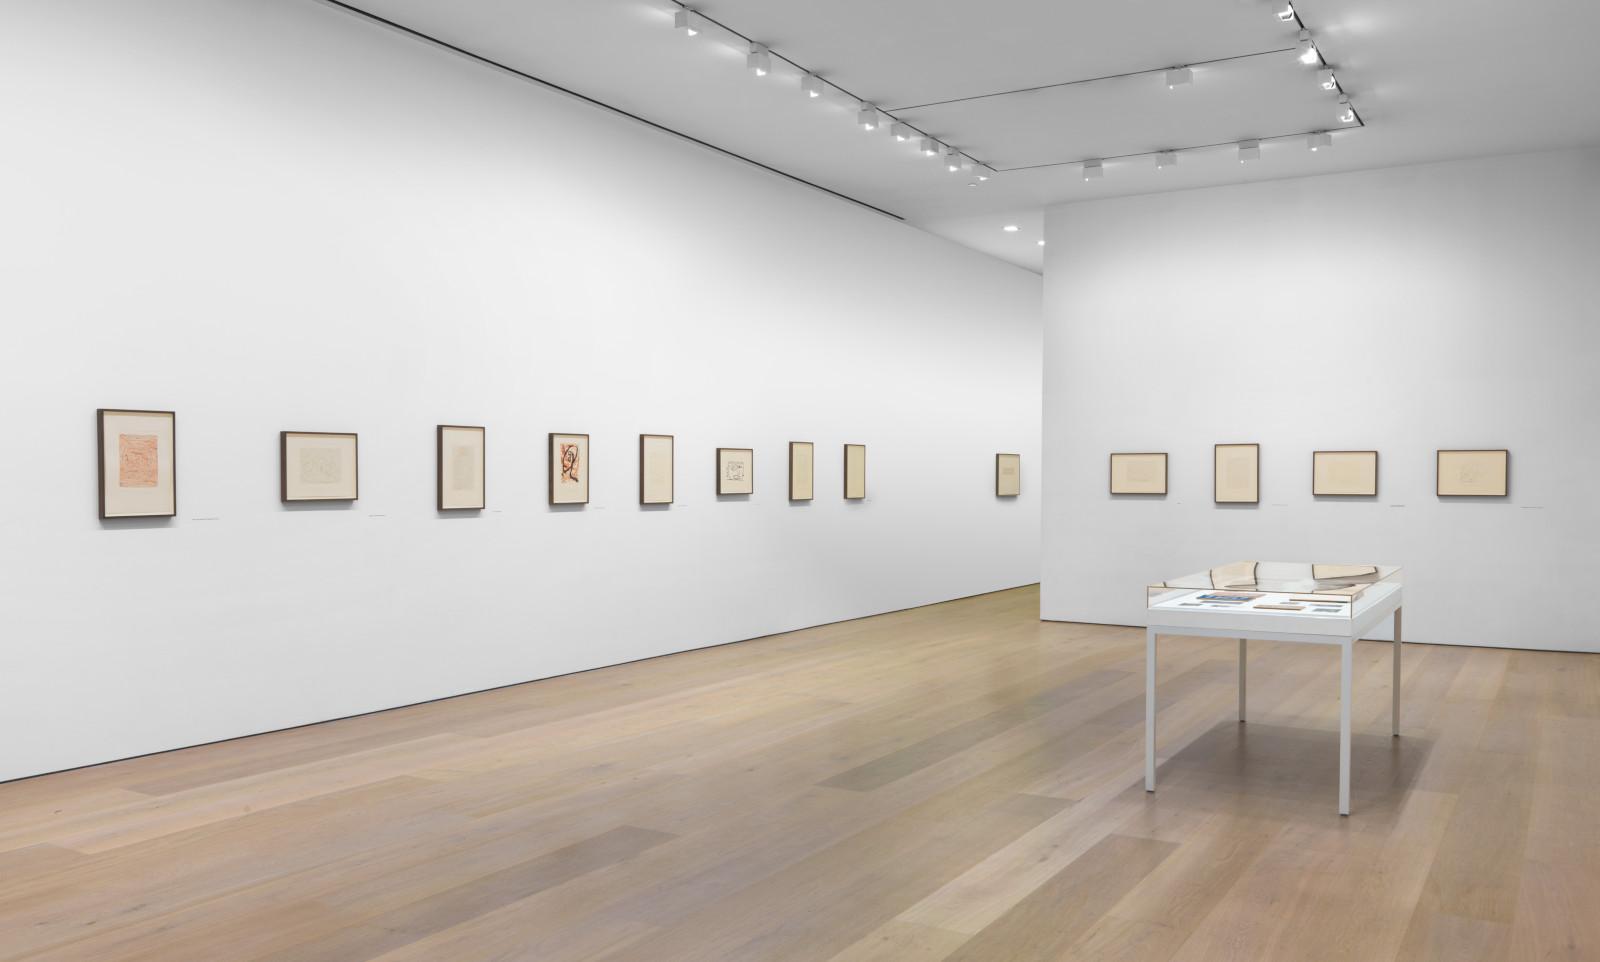 David Zwirner 20th St Paul Klee 1